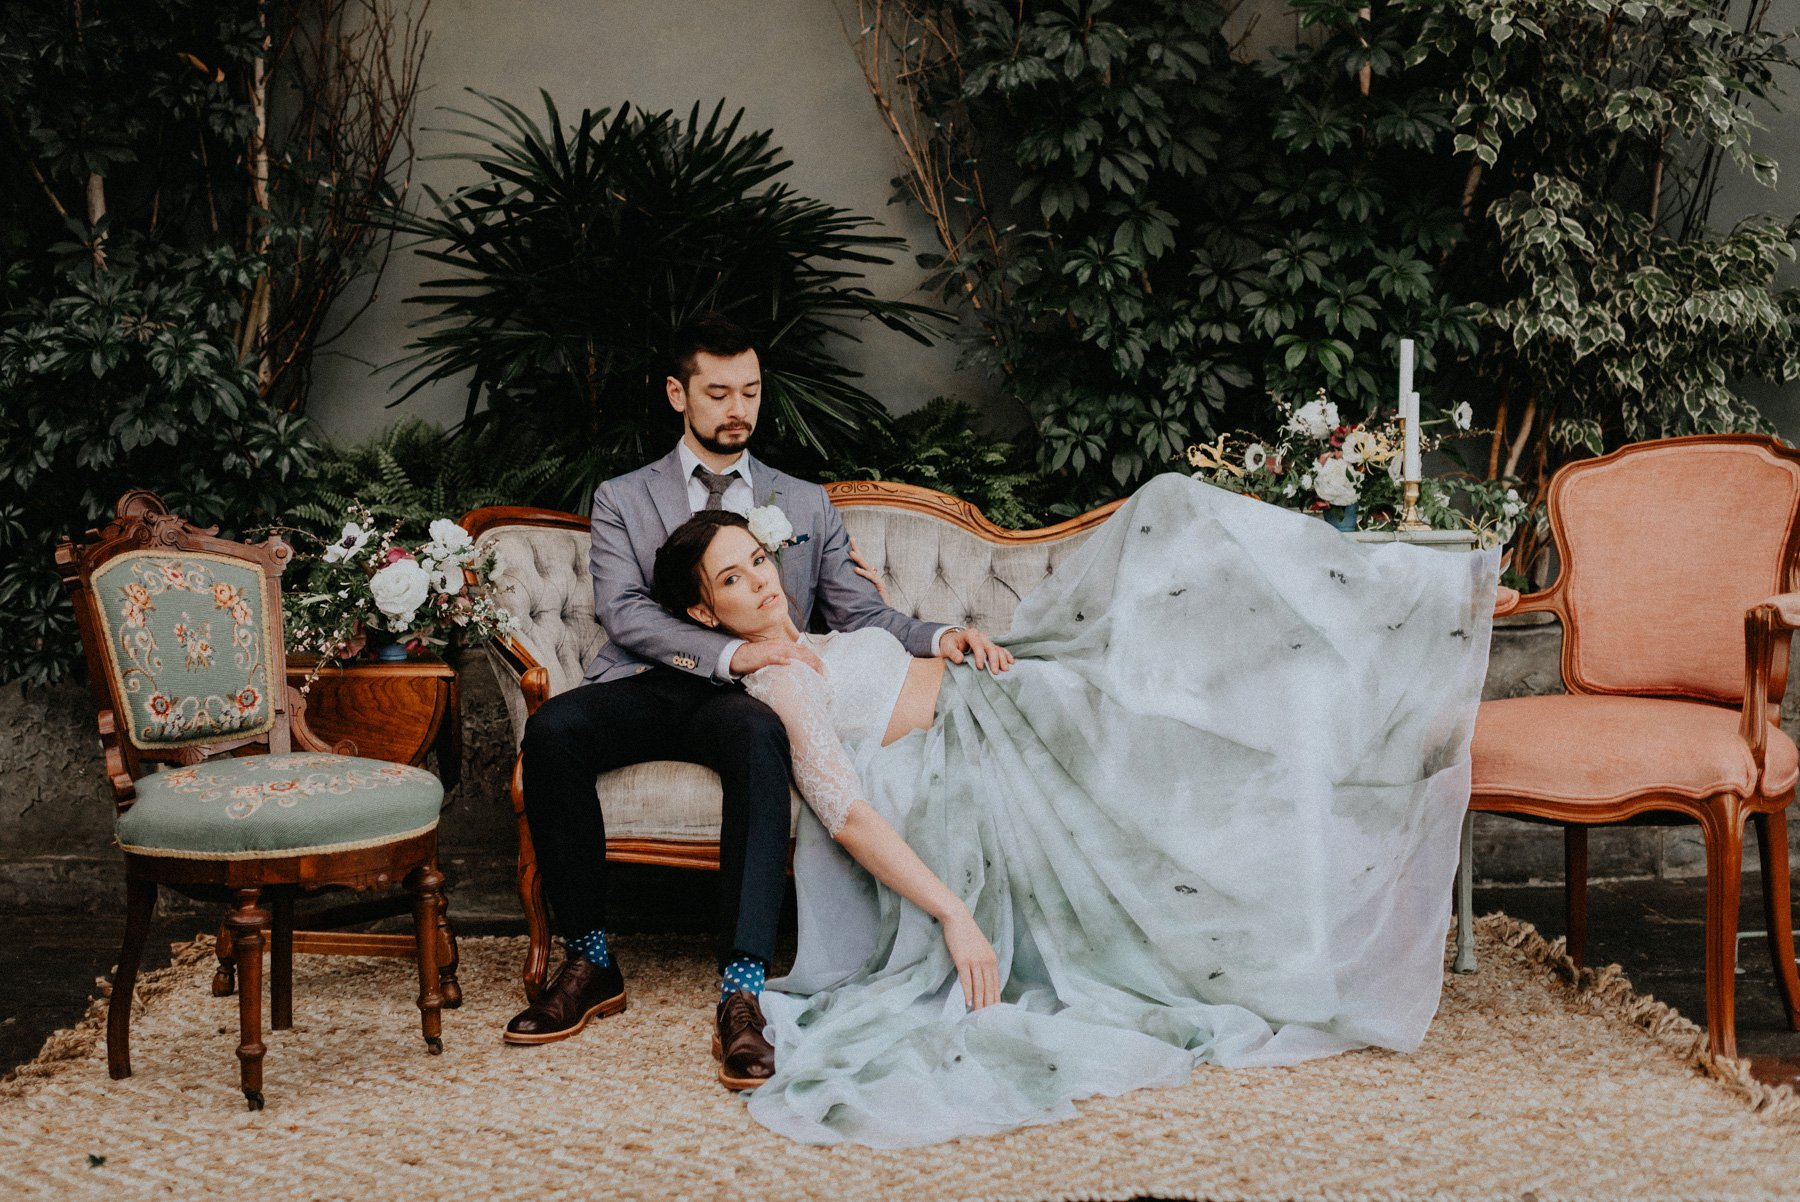 greenhouse-botanical-wedding-39.jpg